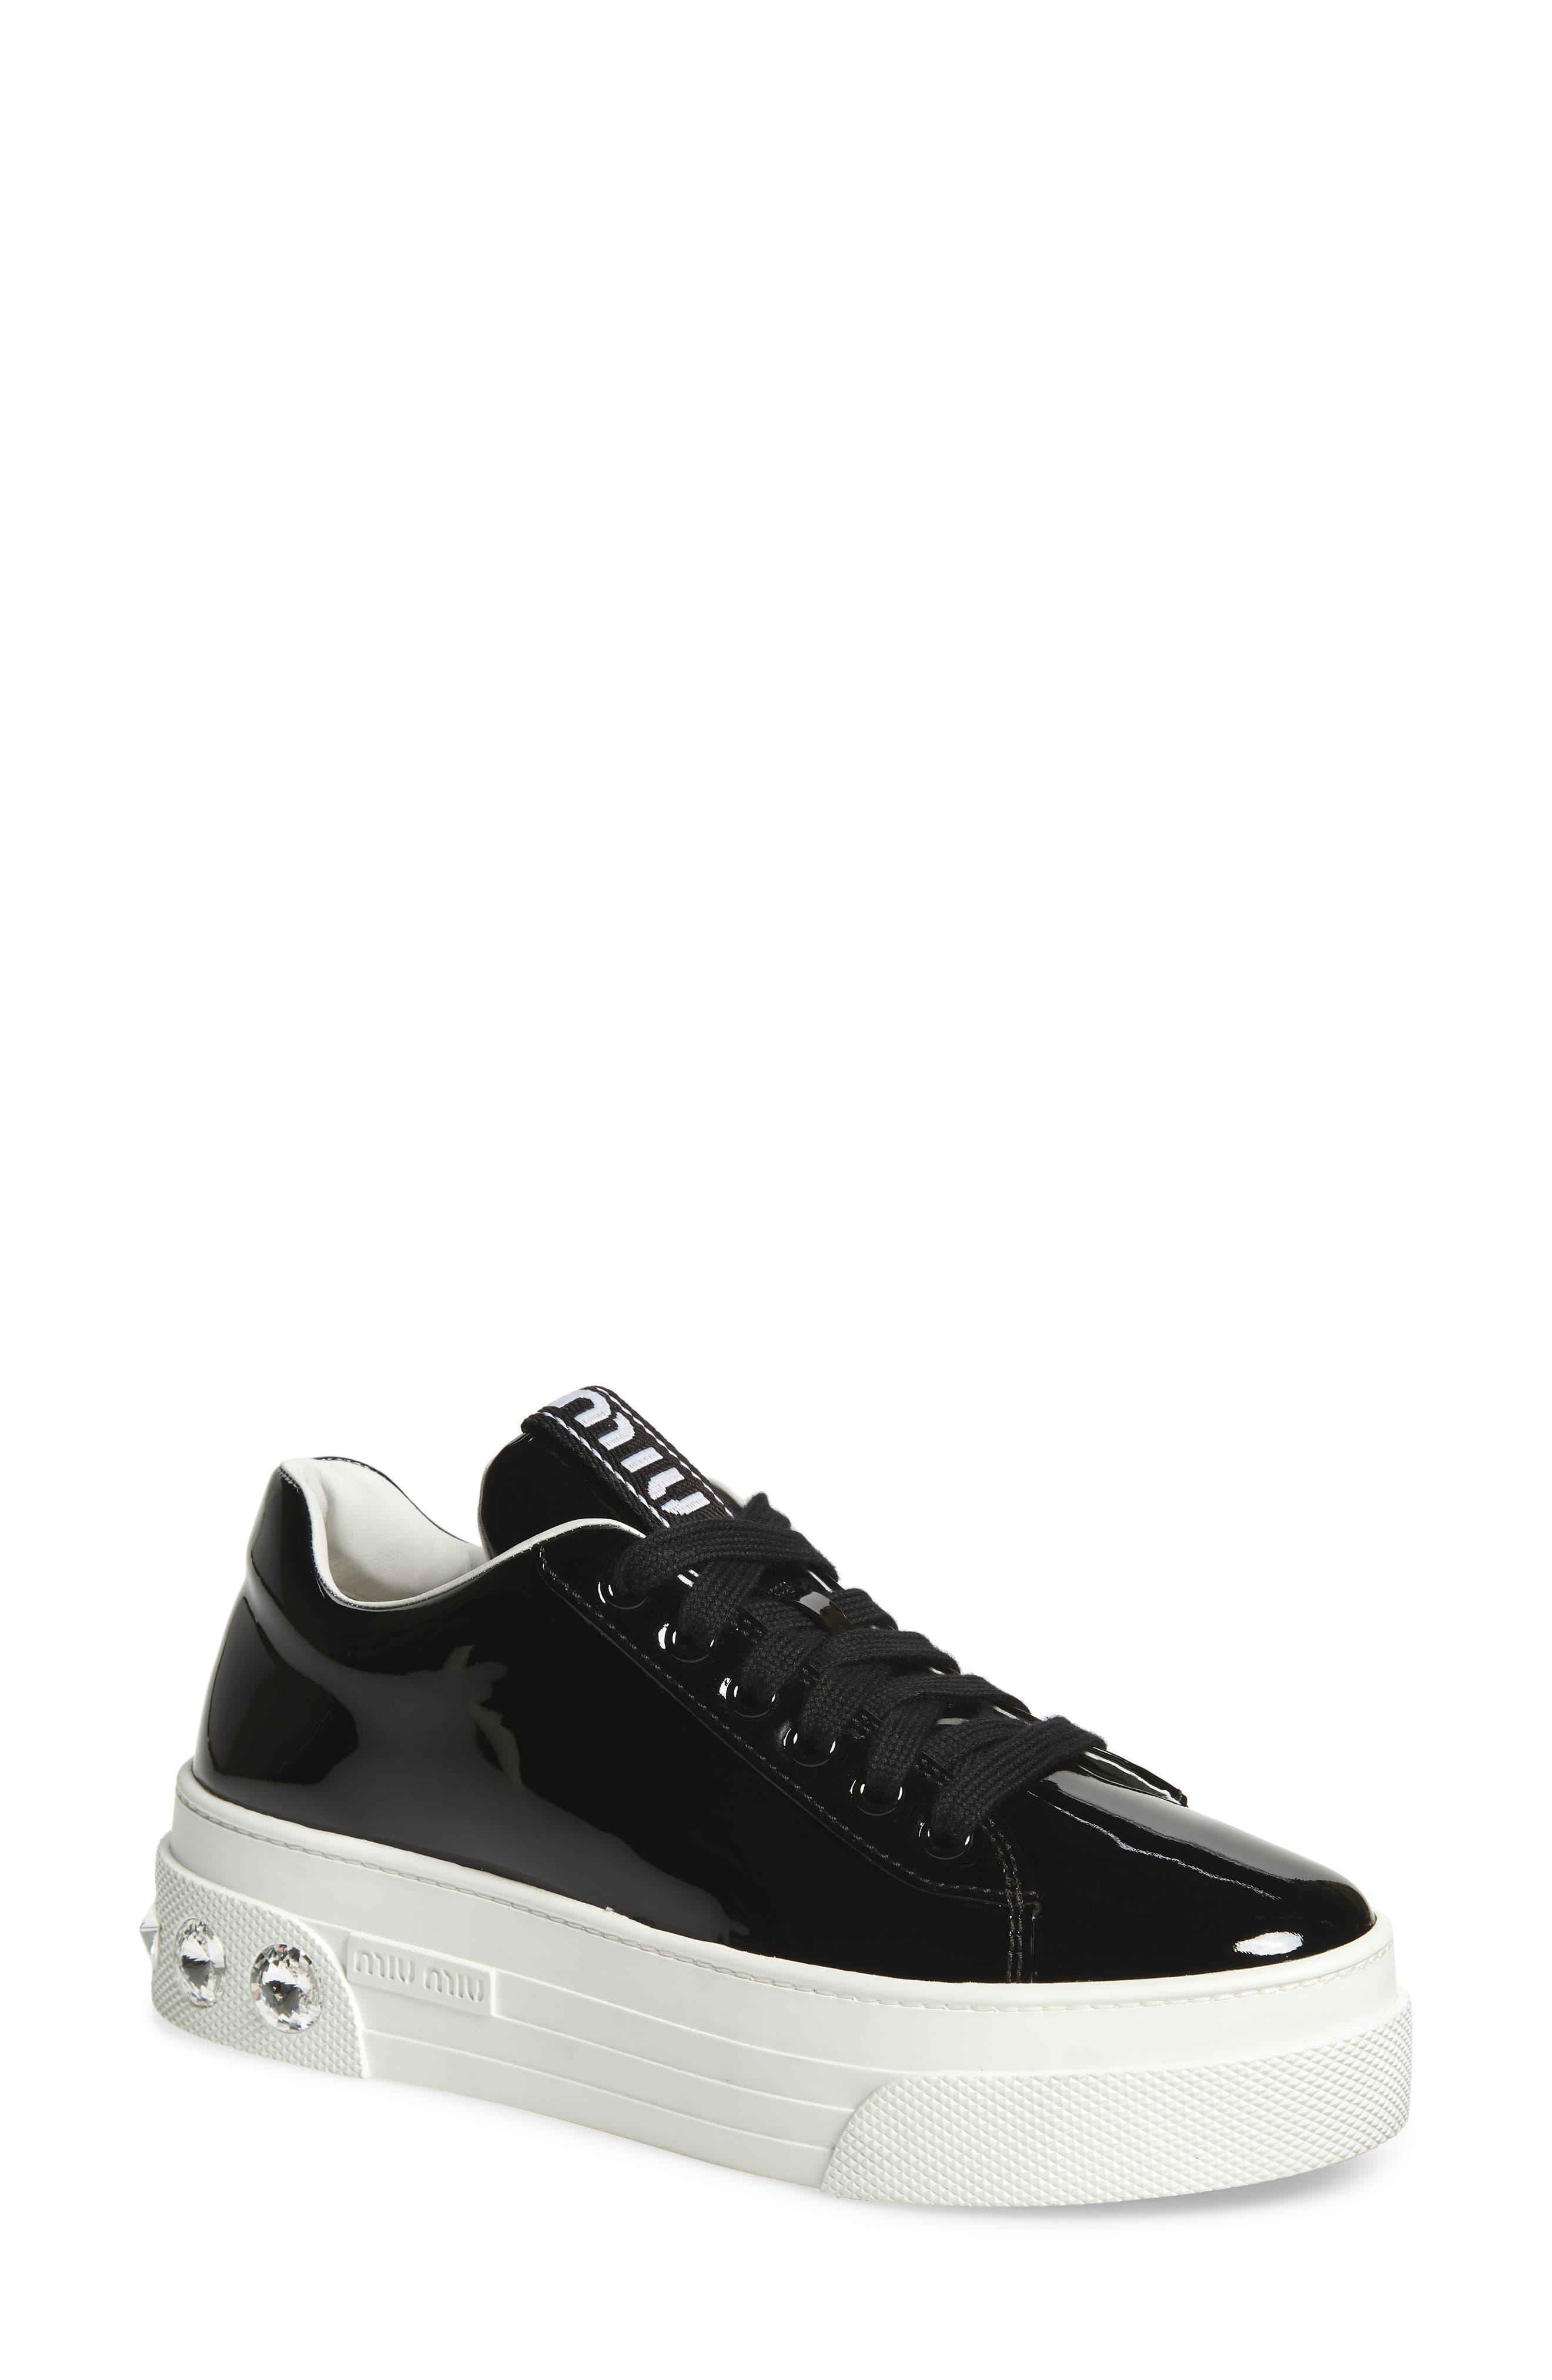 Miu Miu Crystal Detail Skate Sneaker - Black